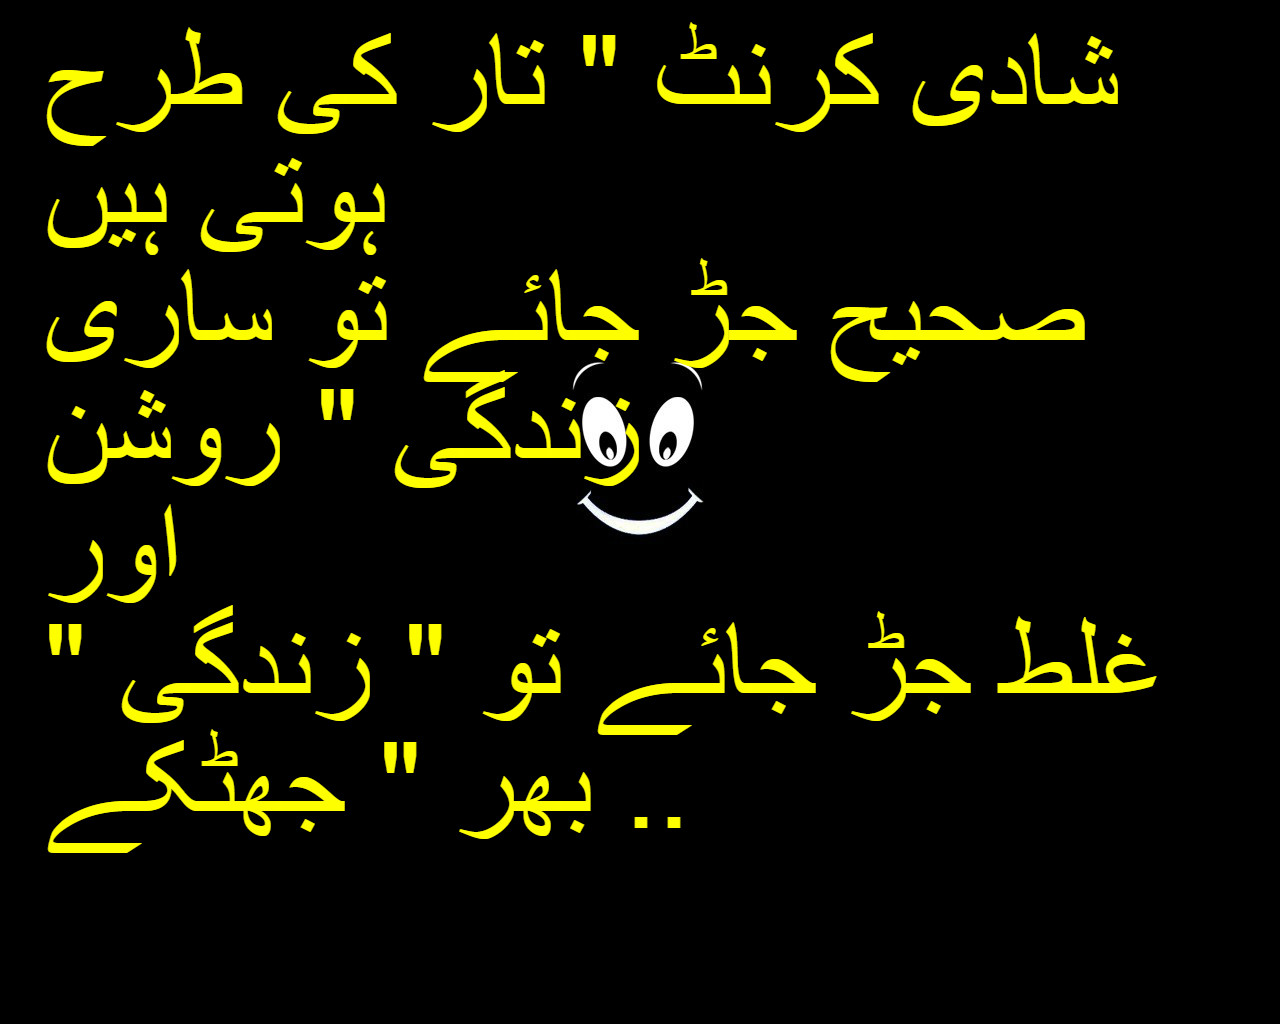 Funny wedding anniversary wishes in urdu